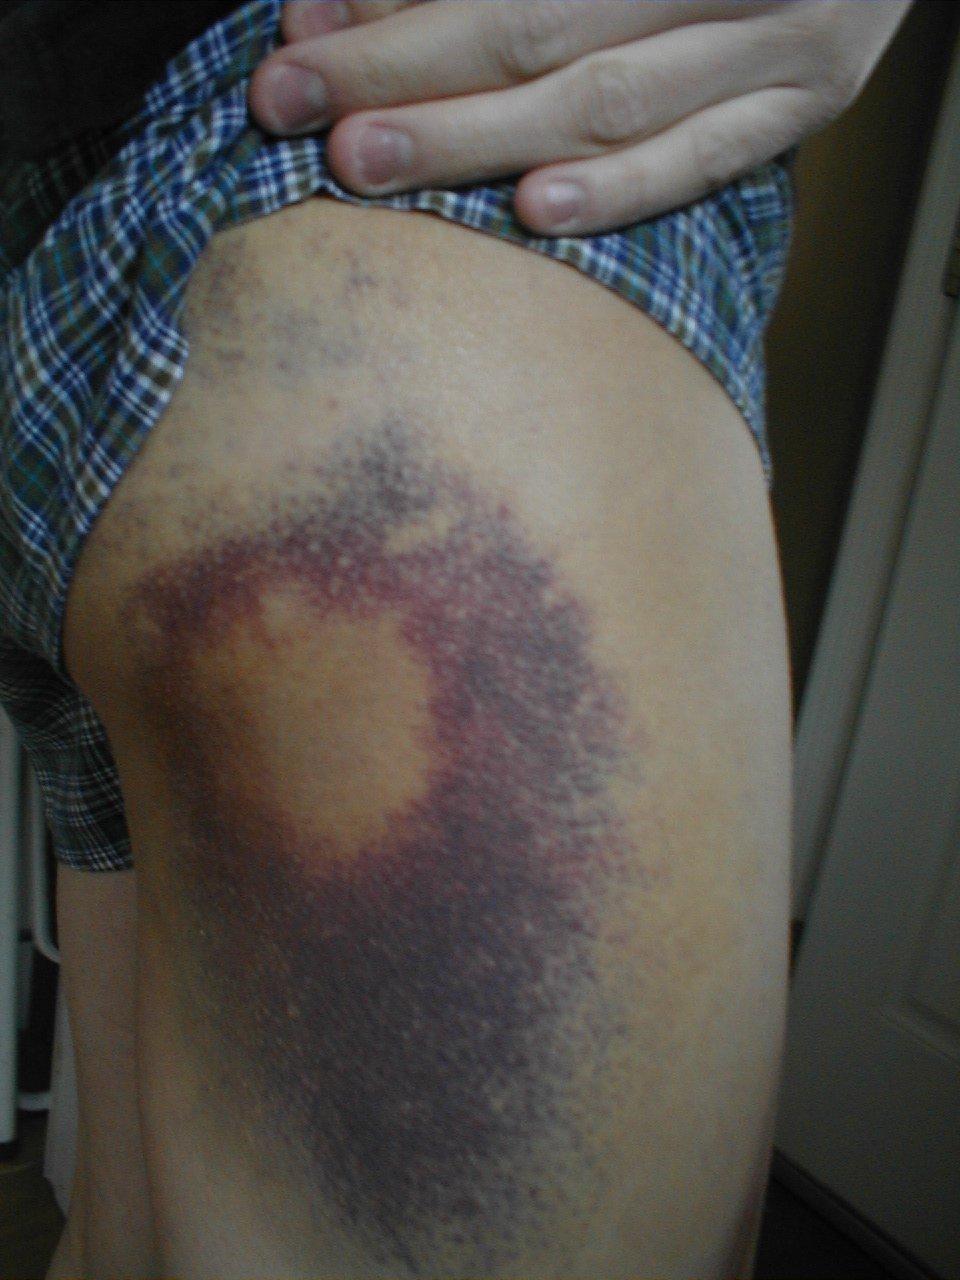 Secksy Leg Bruise 07-08